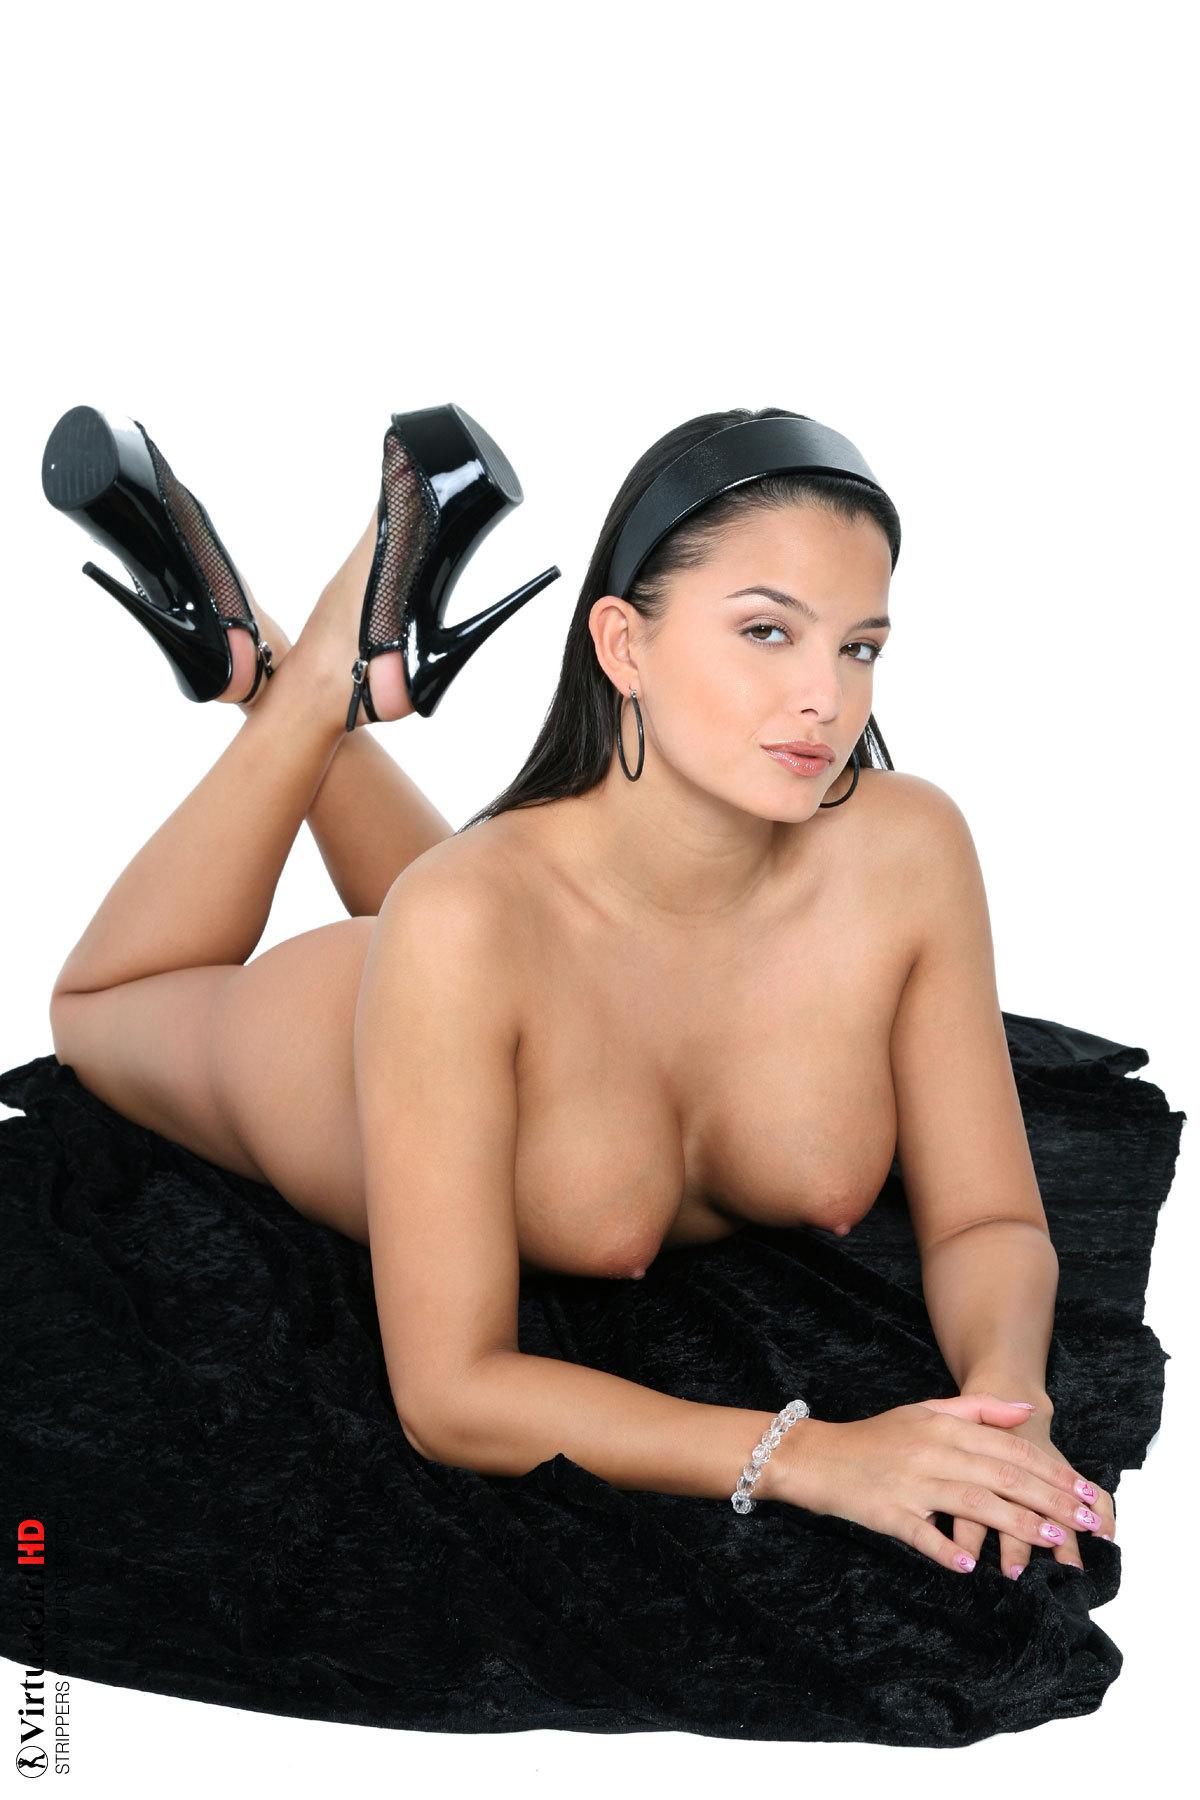 girls stripping butt naked